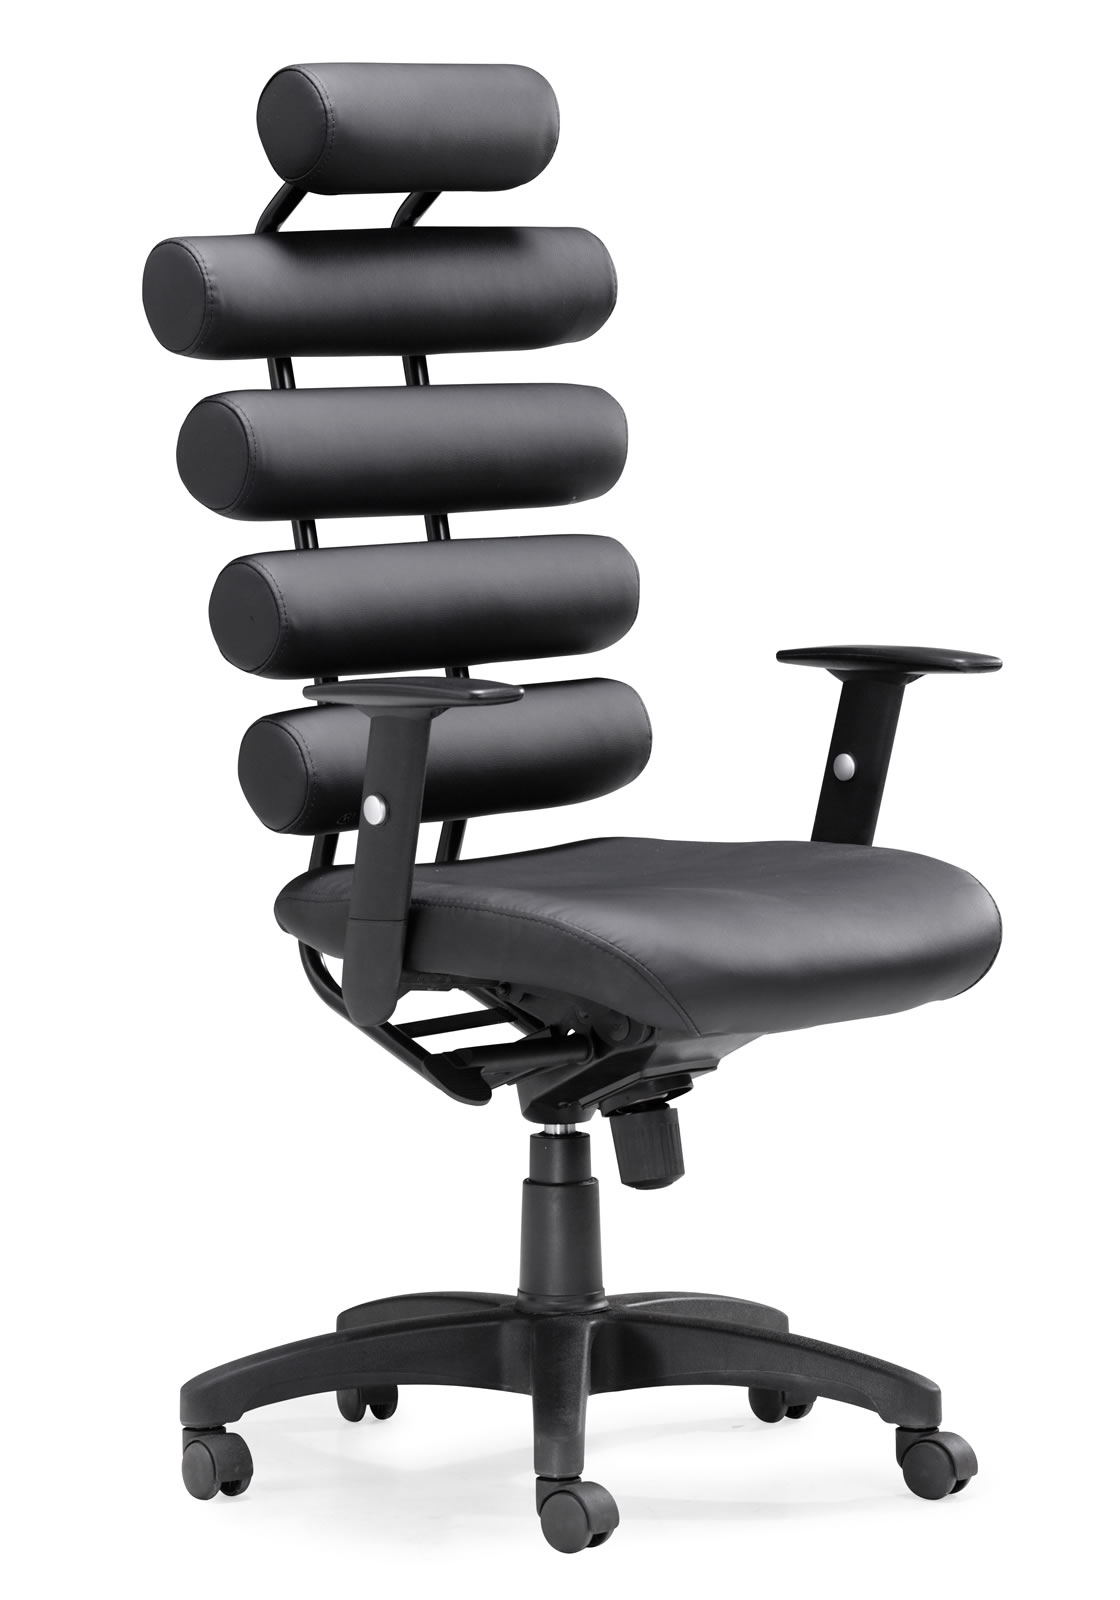 Kitchen chairs black Photo - 5